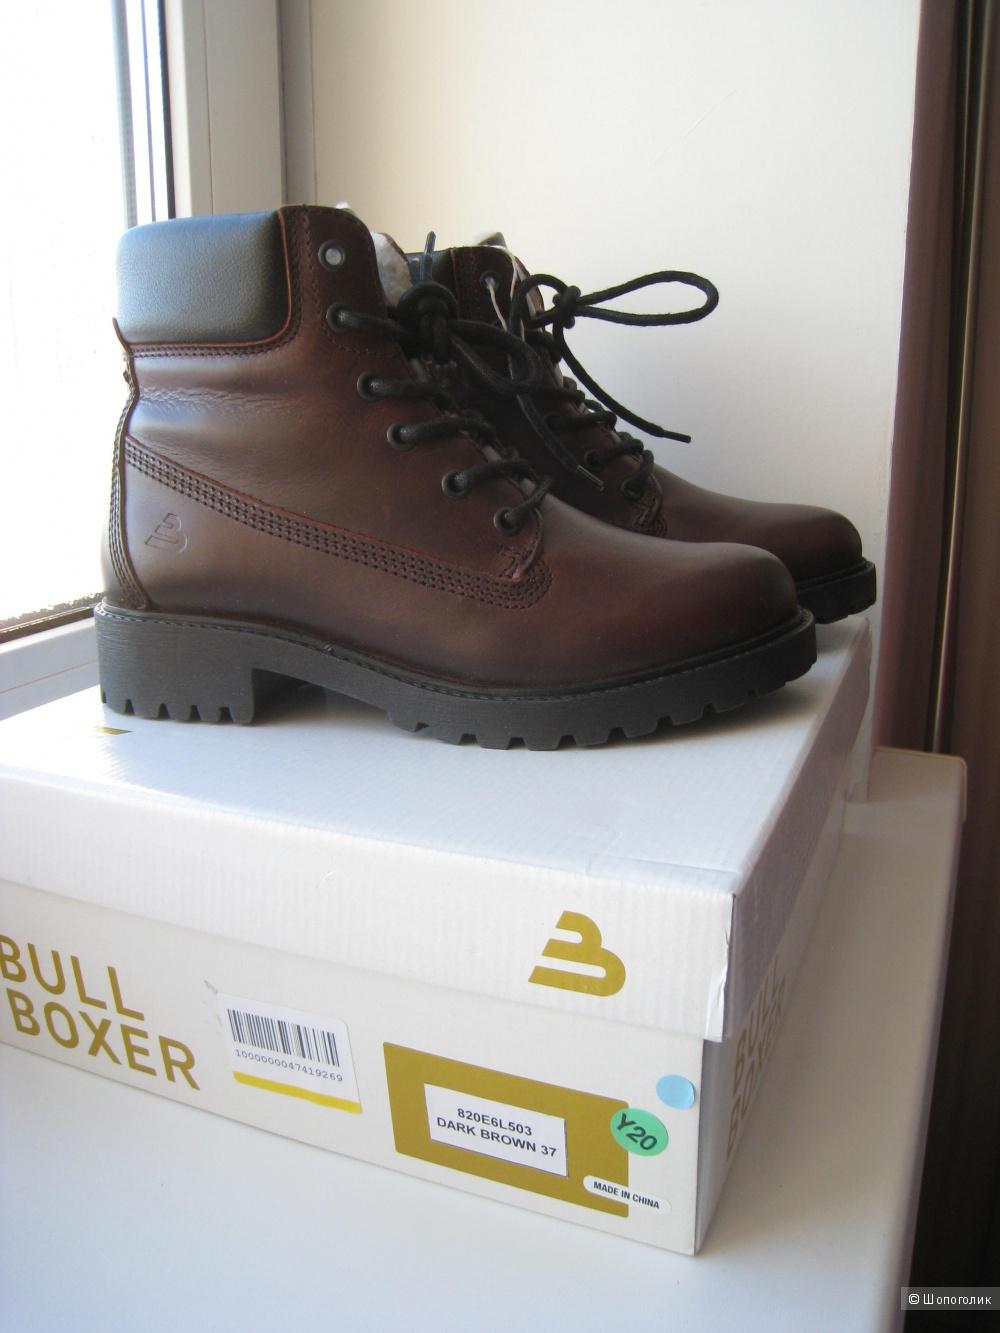 Ботинки утепленные BULL BOXER, 37р.